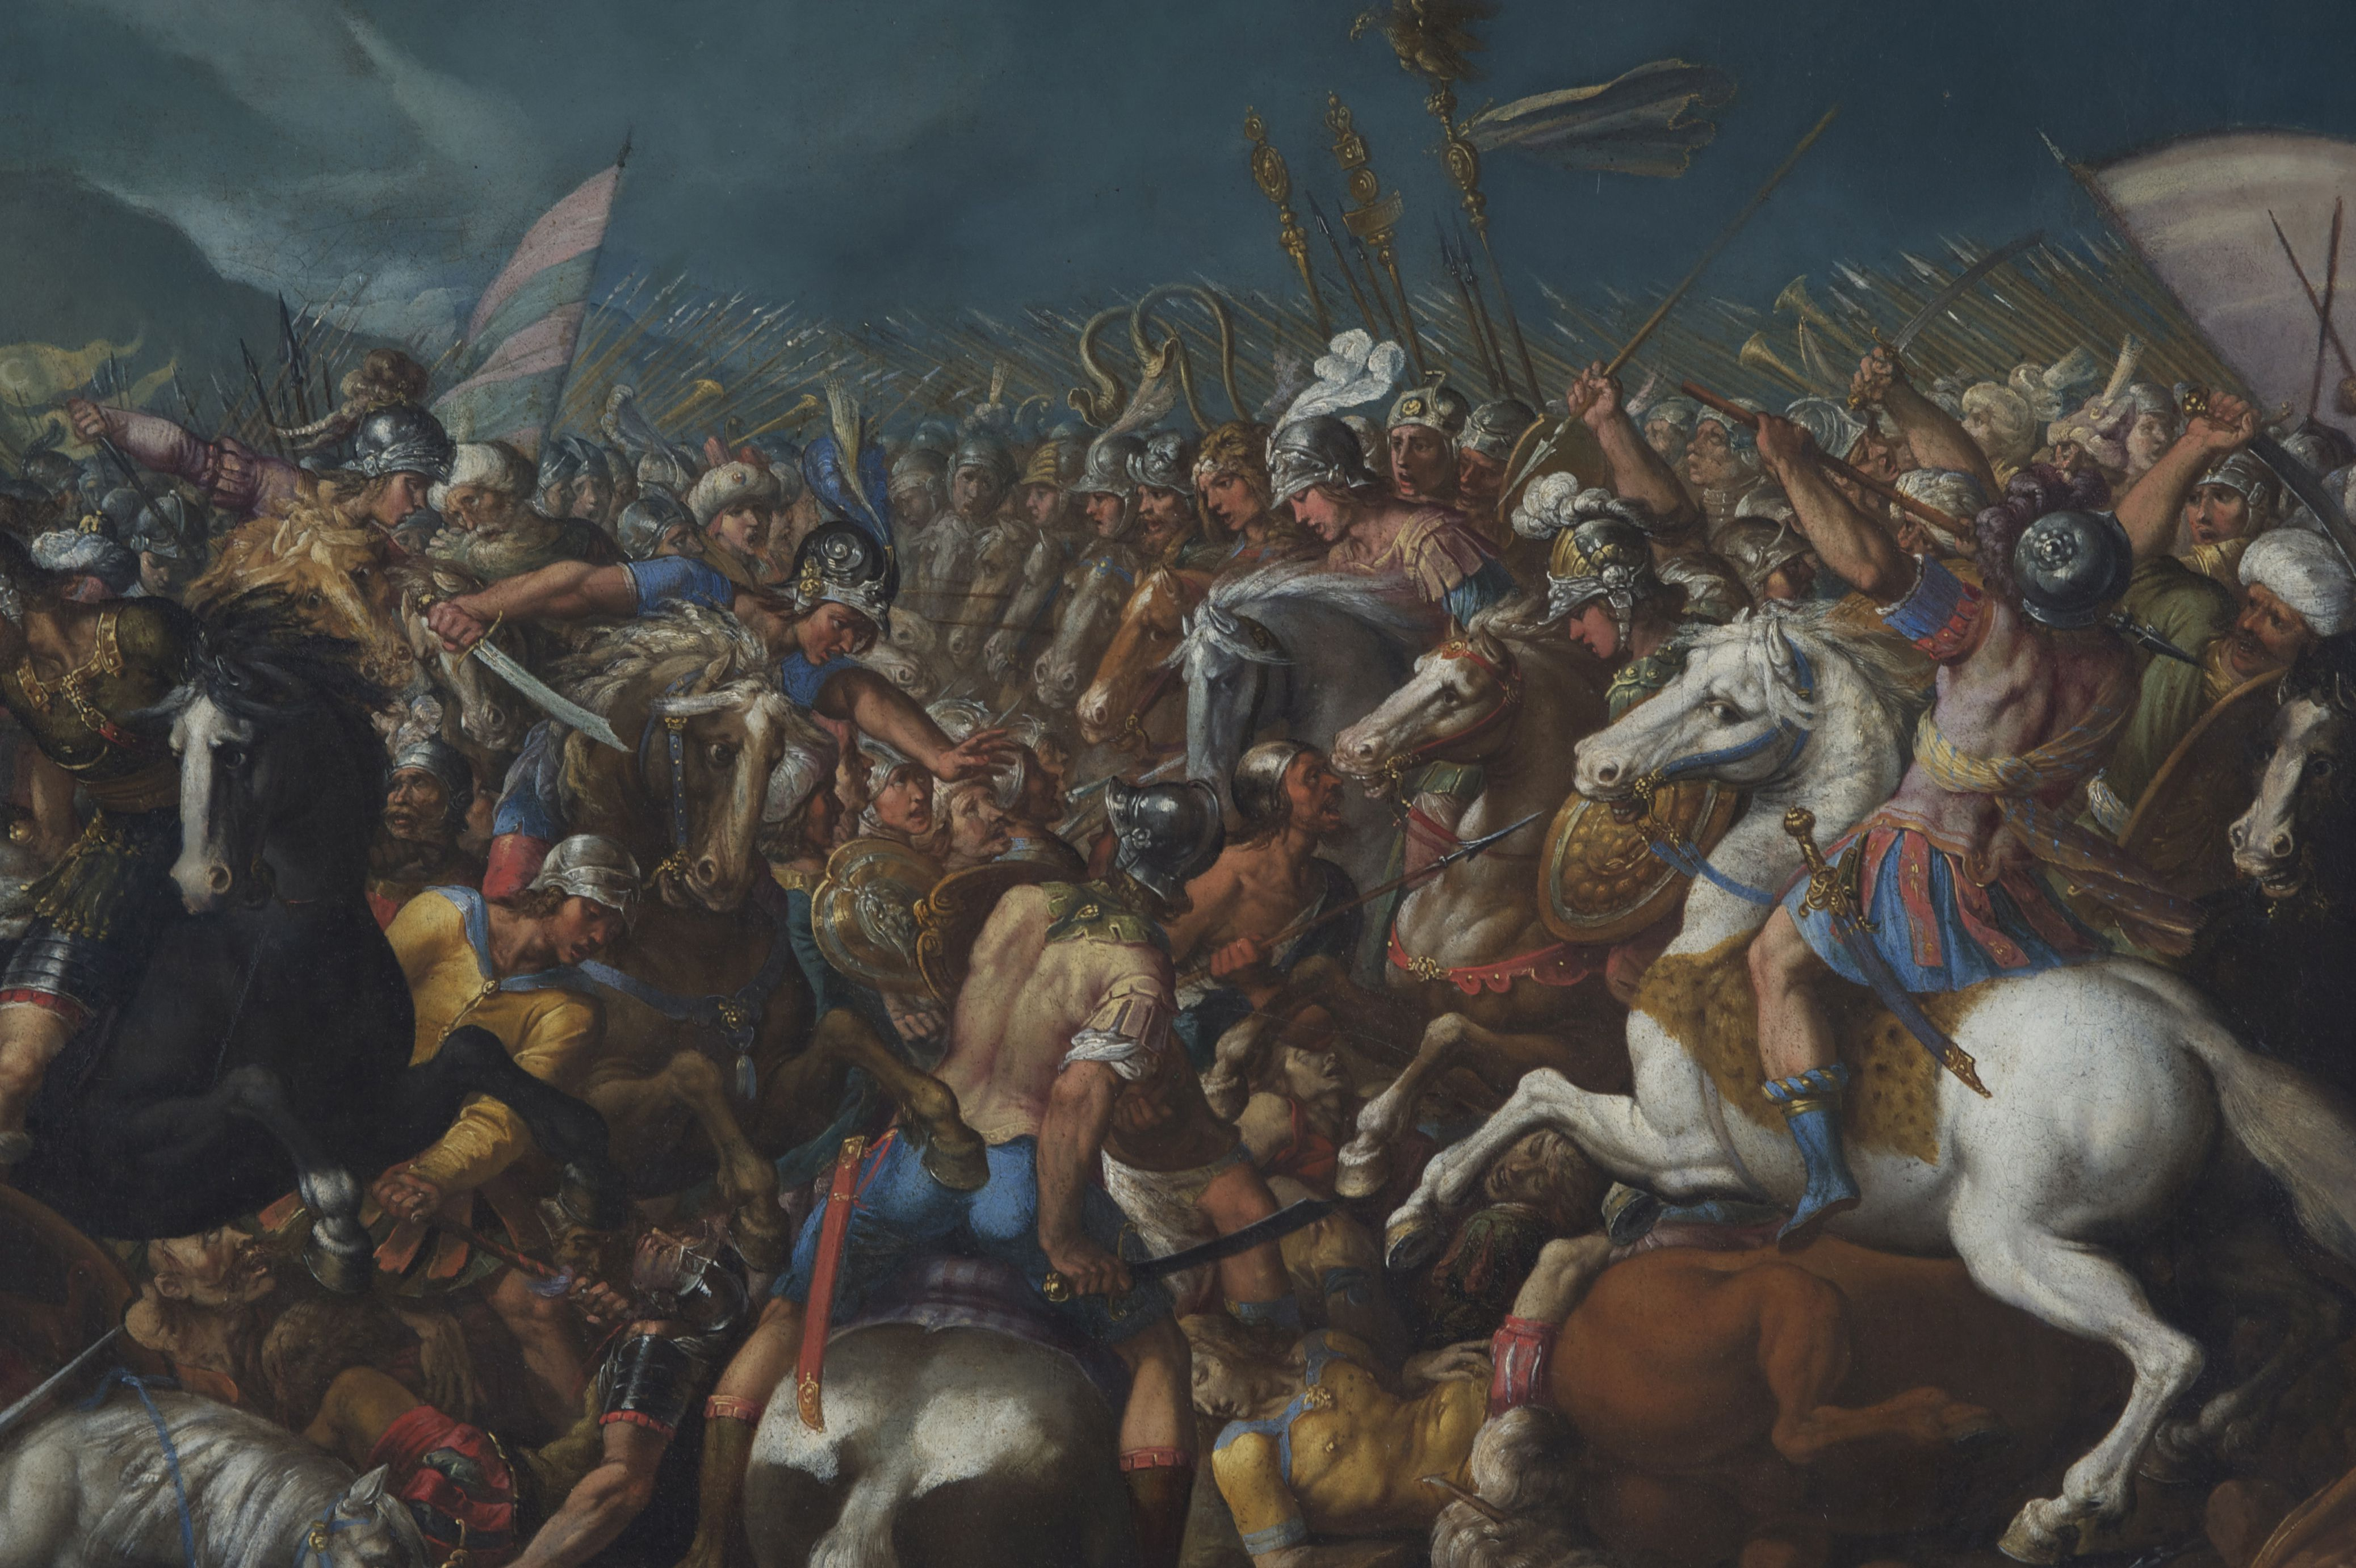 The Fight between Scipio Africanus and Hannibal, c. 1616-1618. Artist: Cesari, Bernardino (1565-1621)